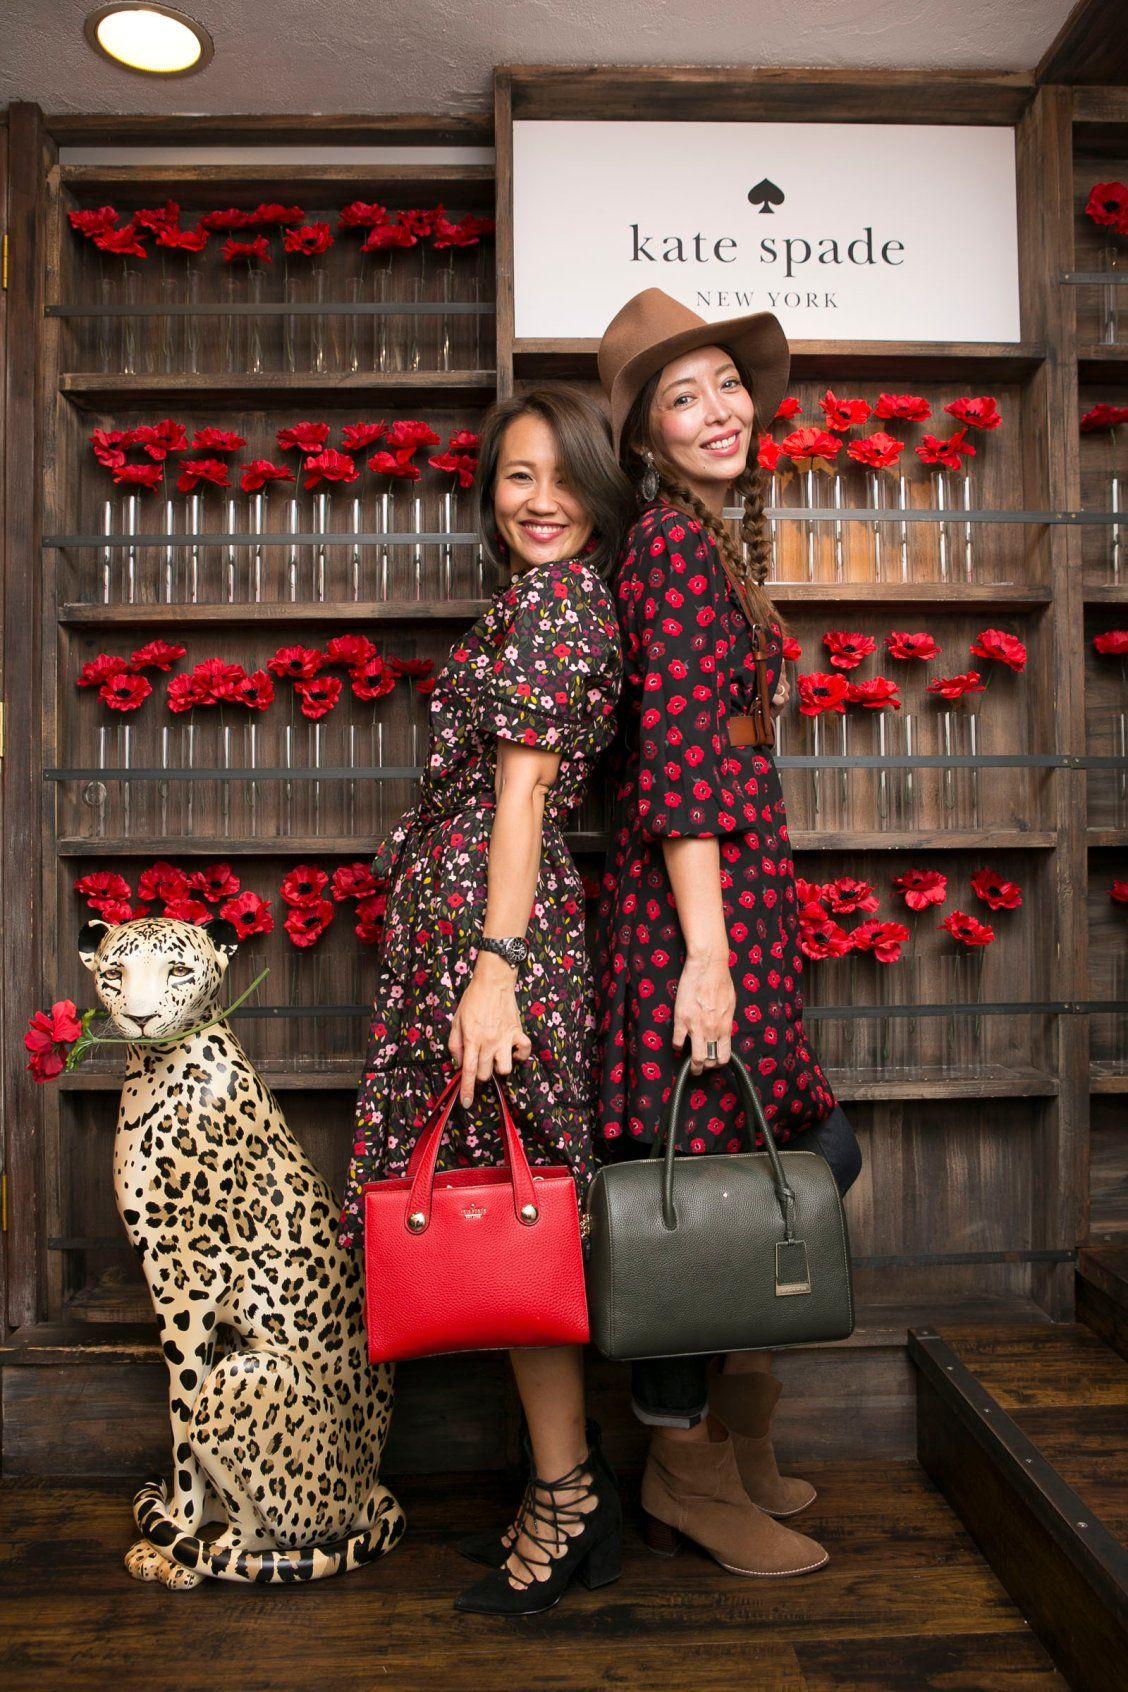 Katespade Everythingkatespade Kate Spade Style Fashion Love Her Style